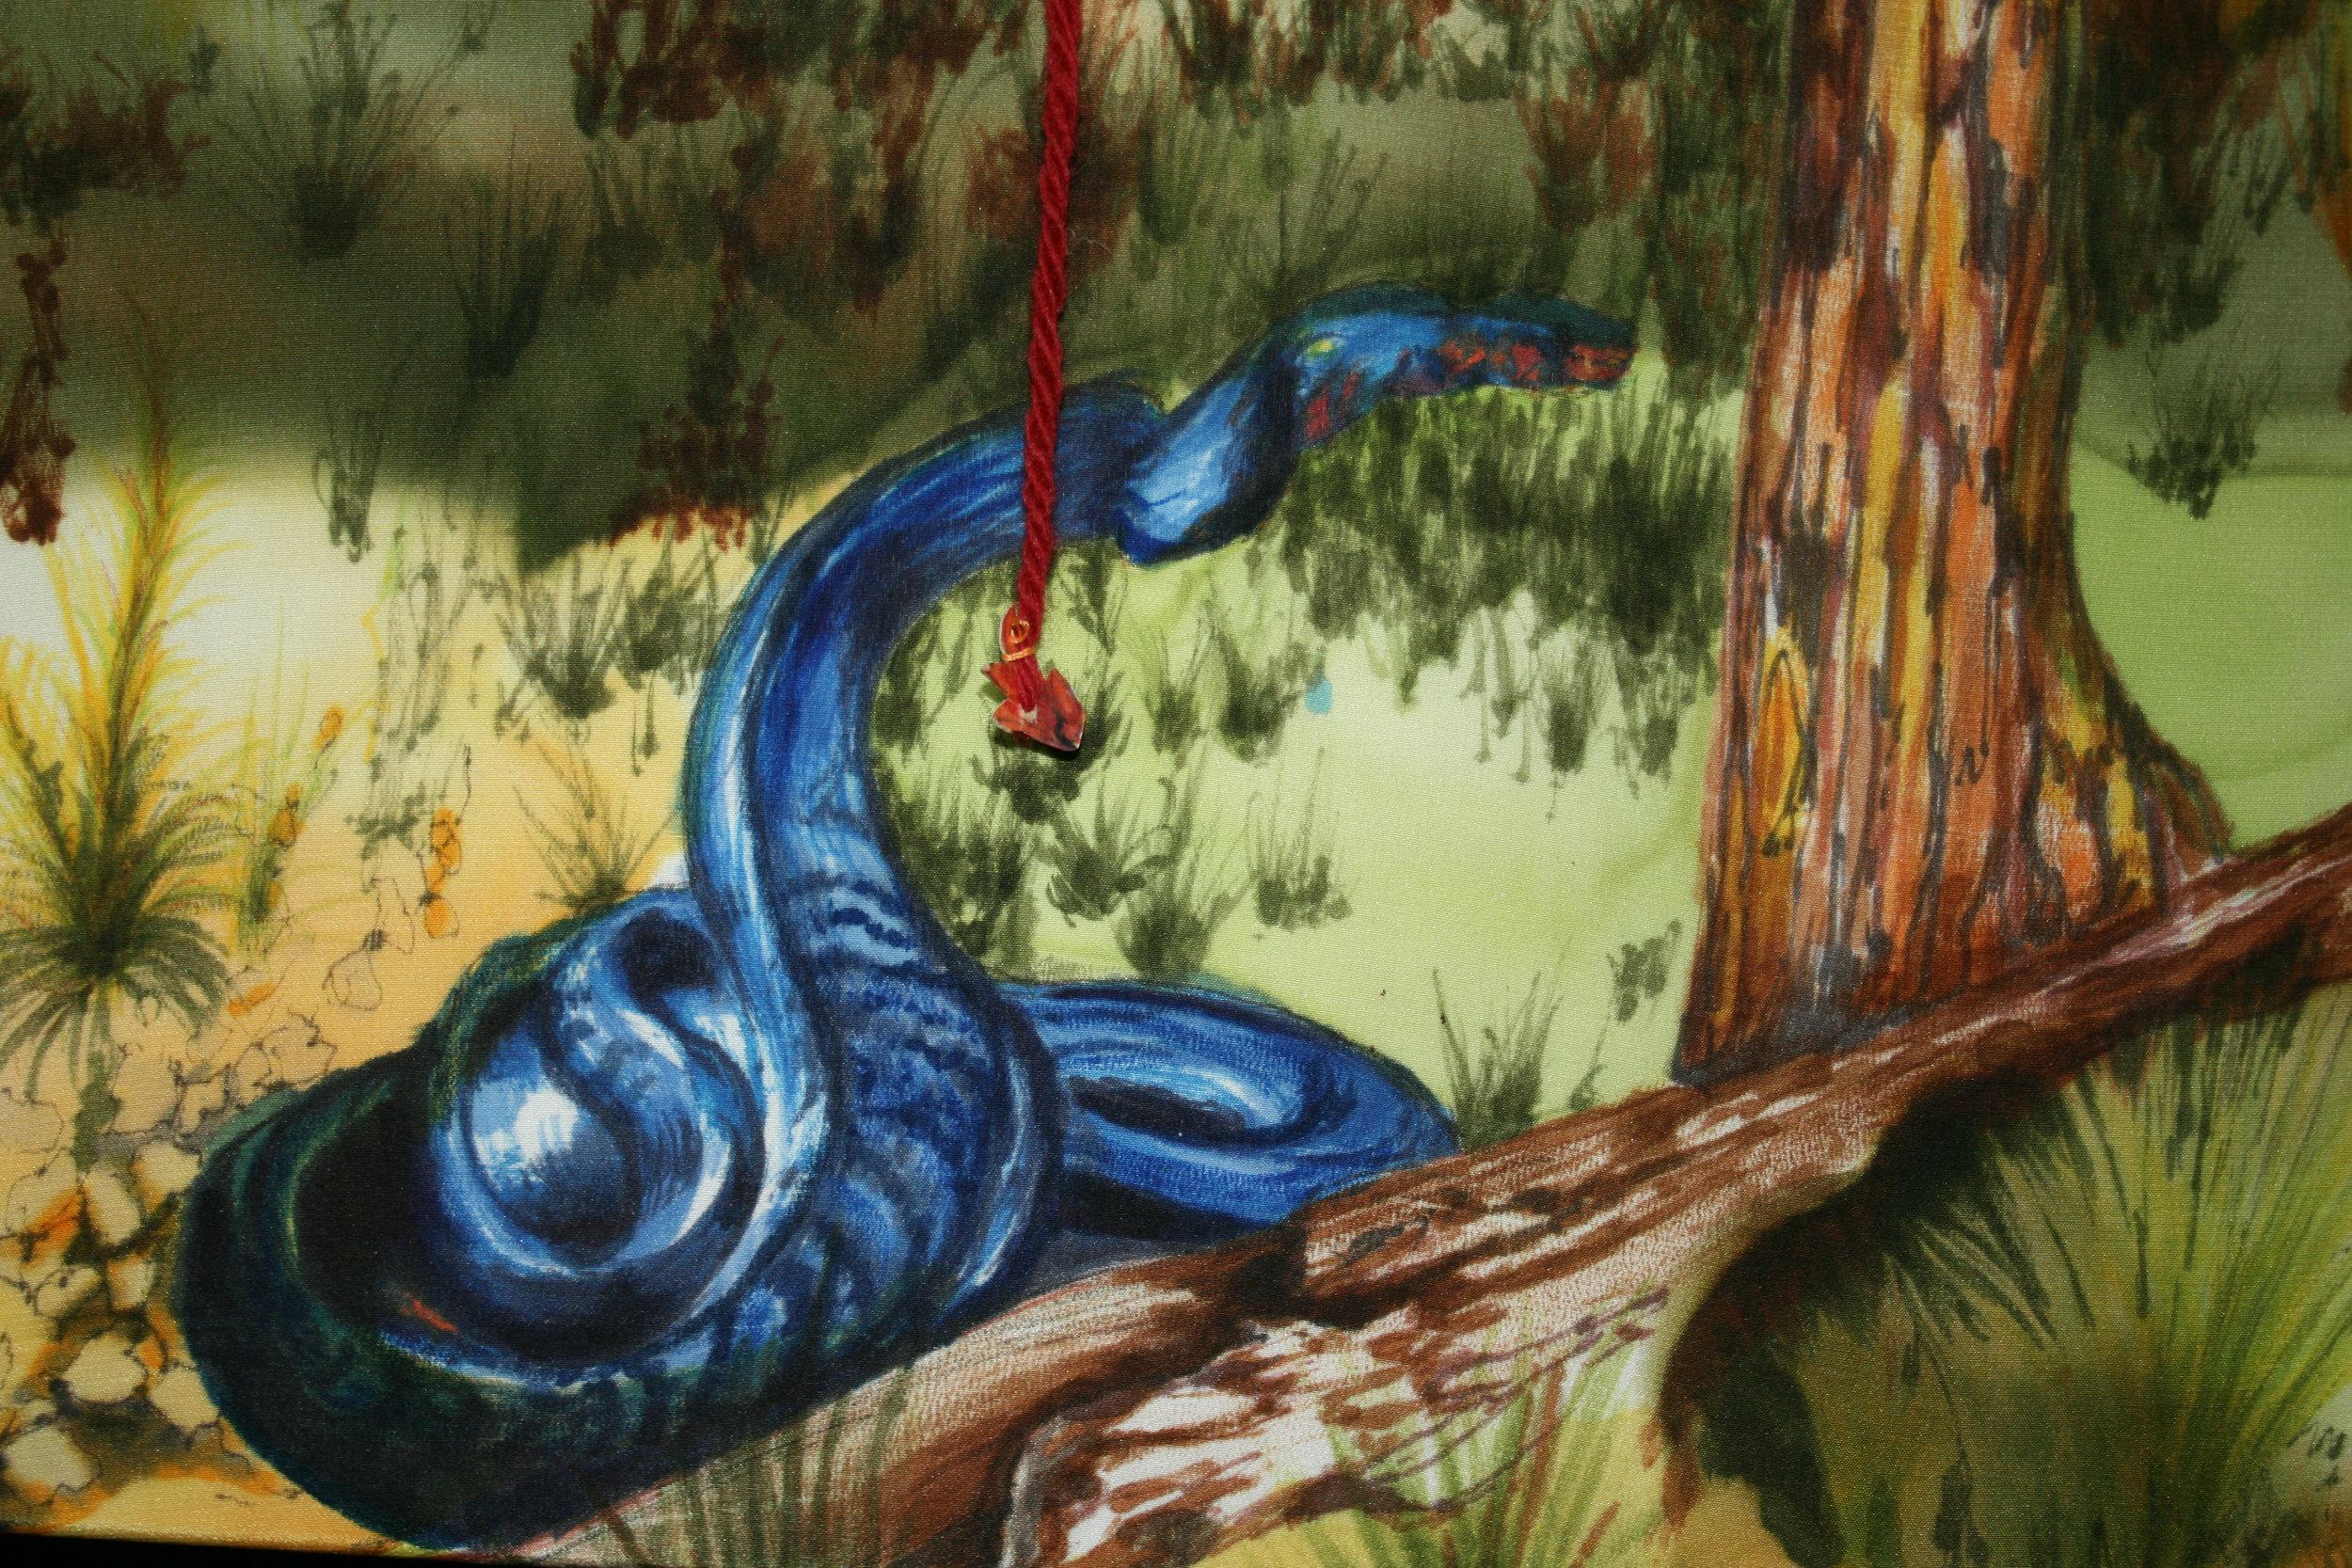 Indigo Snake indigenous only to the long leaf pine ecosystem.